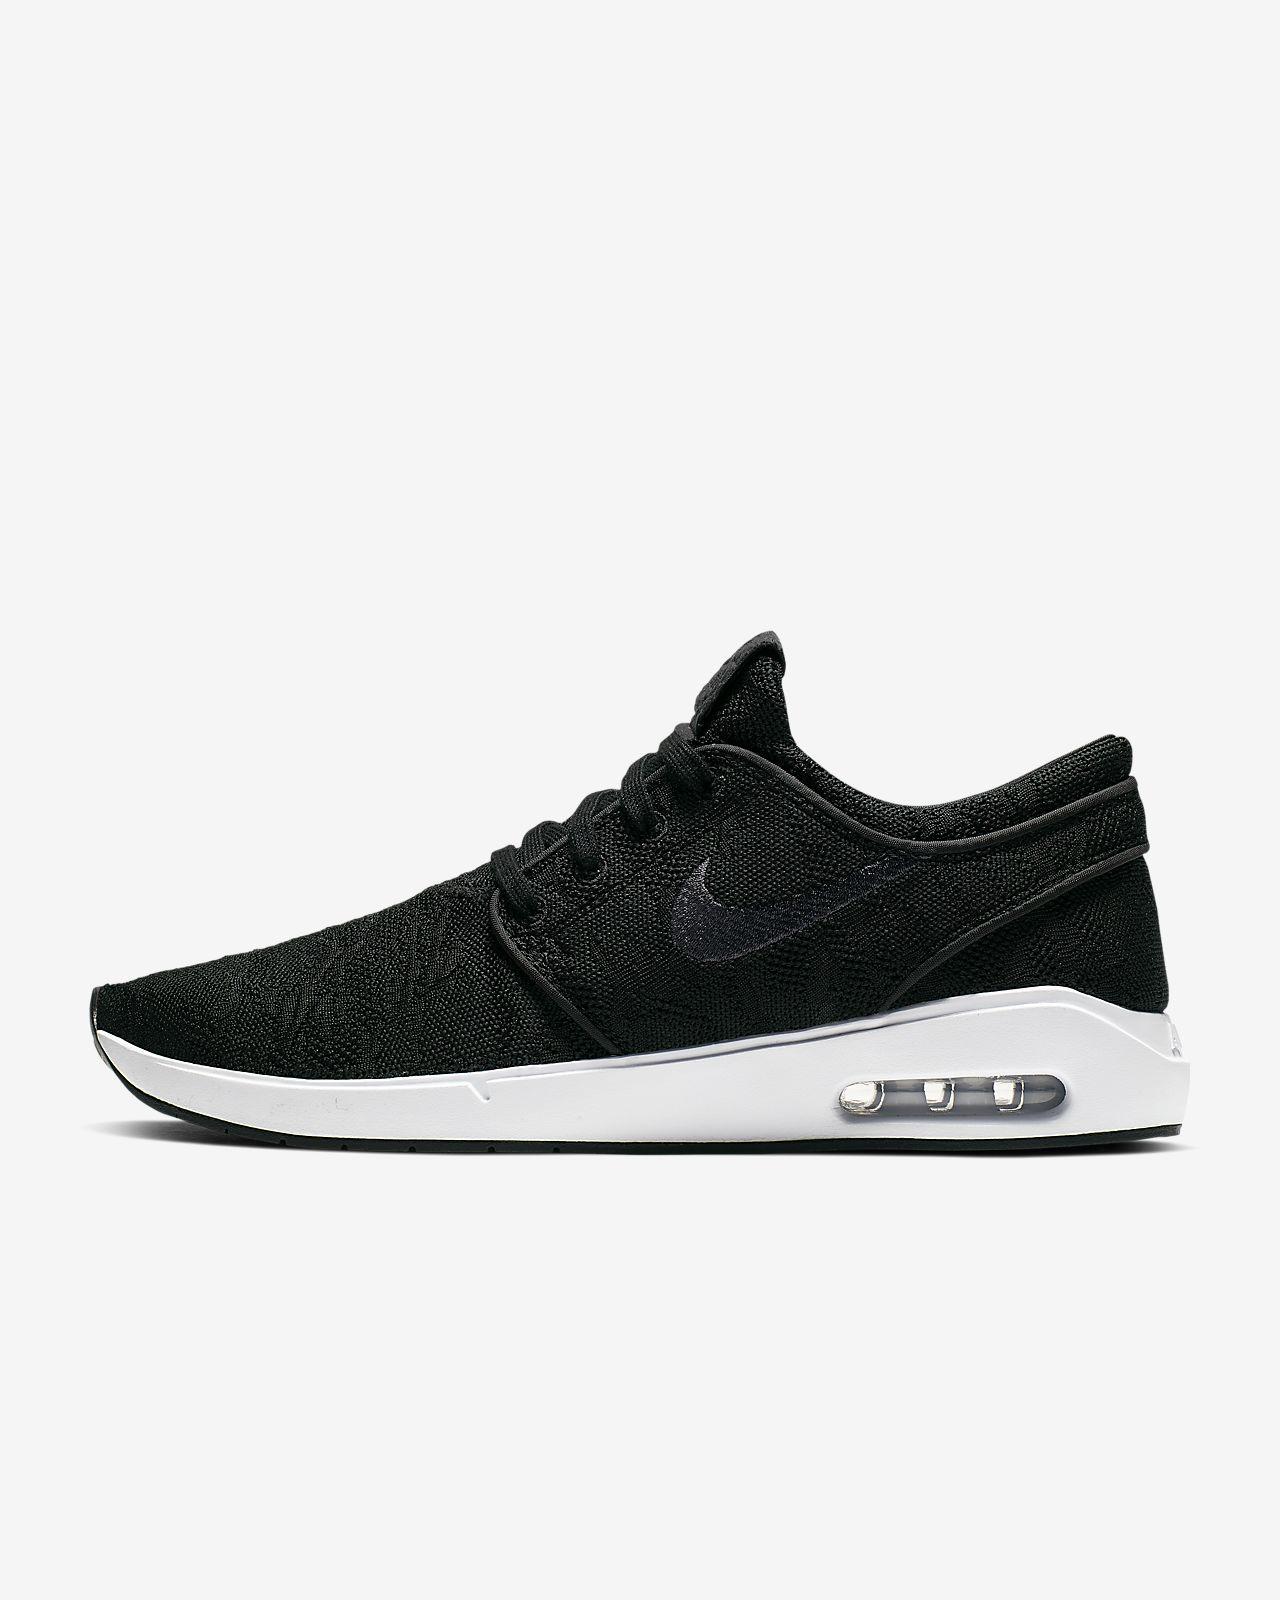 Nike SB Air Max Stefan Janoski 2 Herren-Skateboardschuh